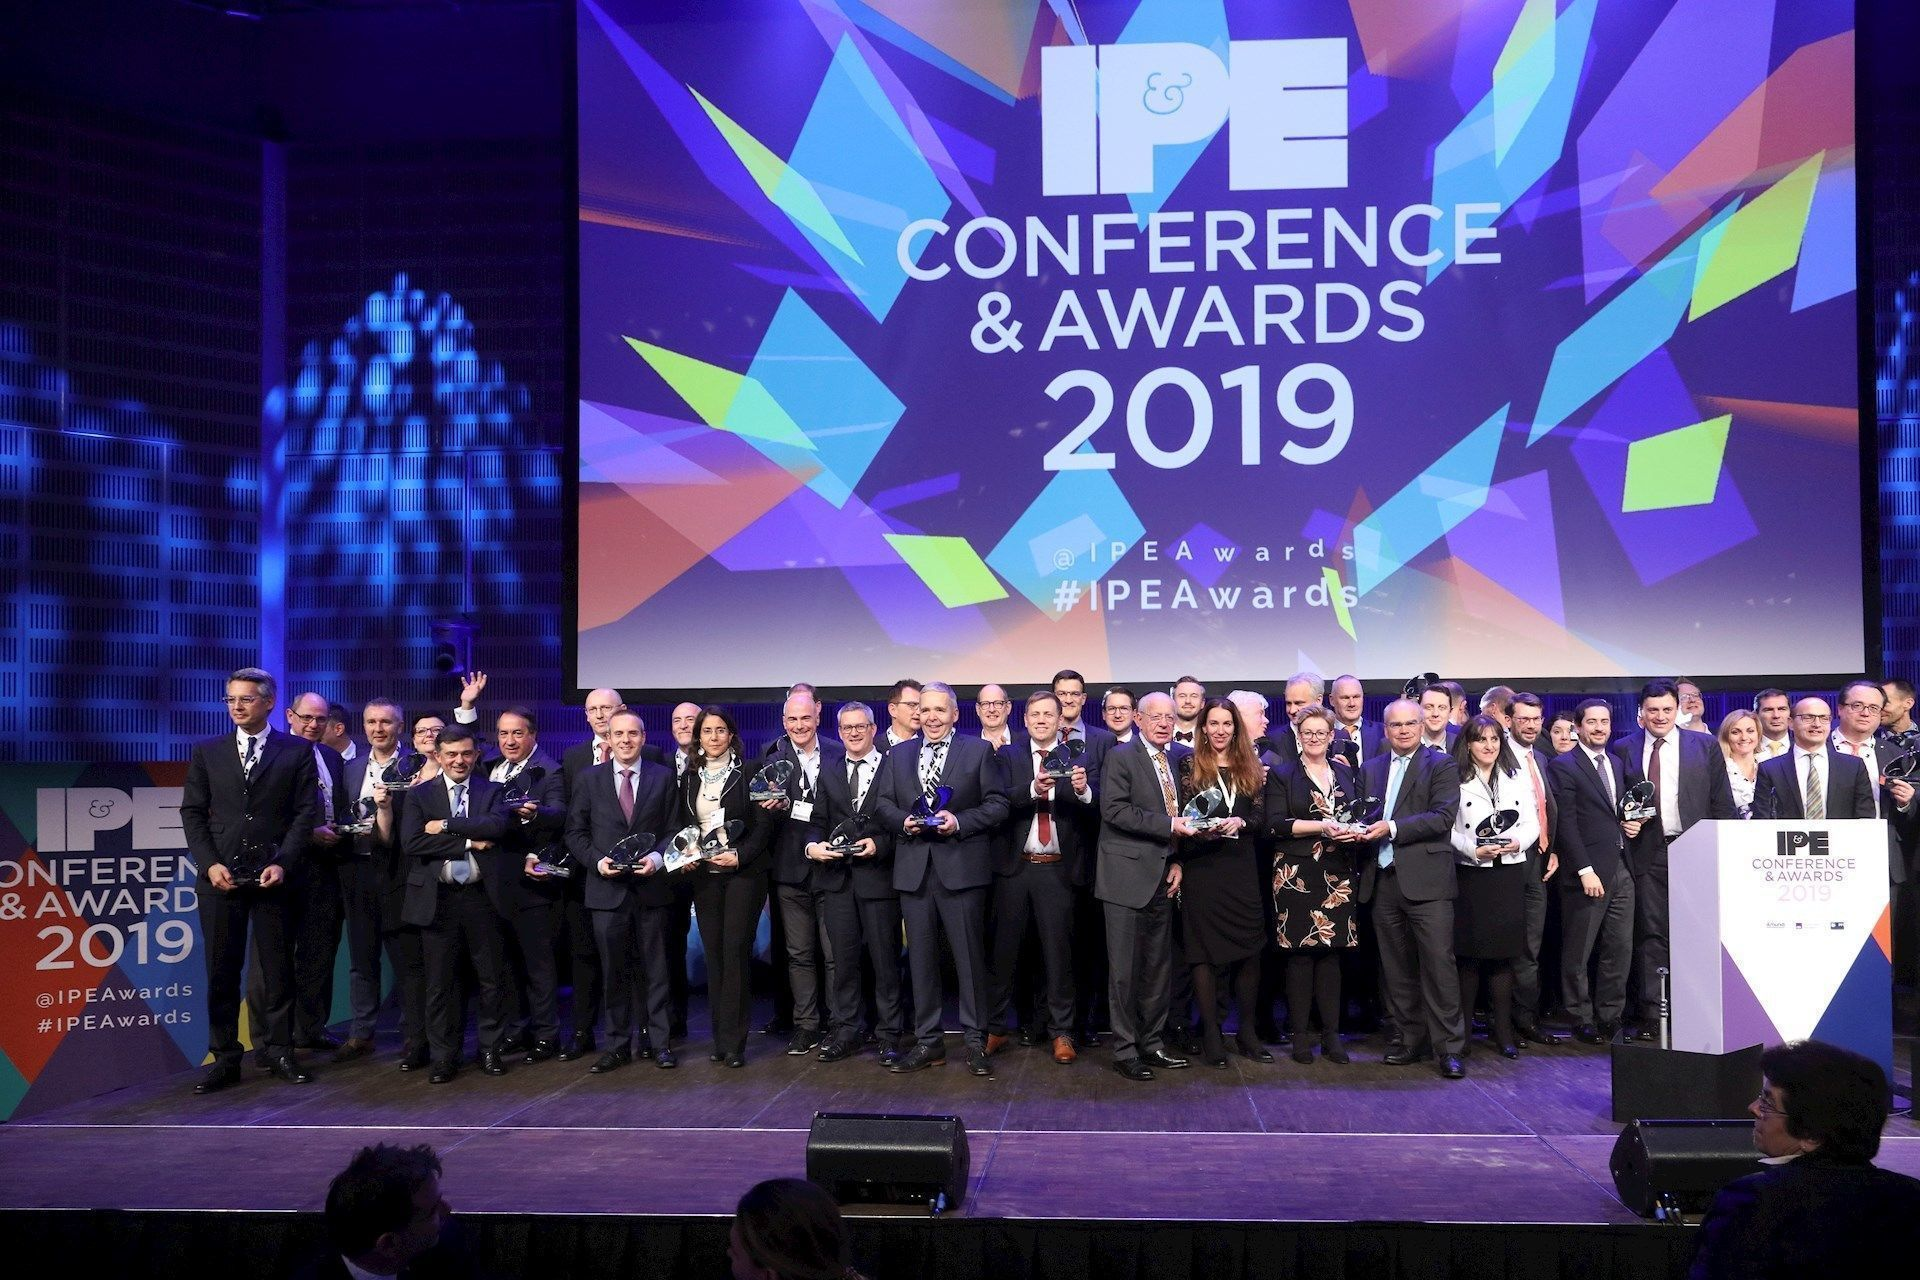 ipe-awards-2019-winner-presentation-photo-all-winners-1